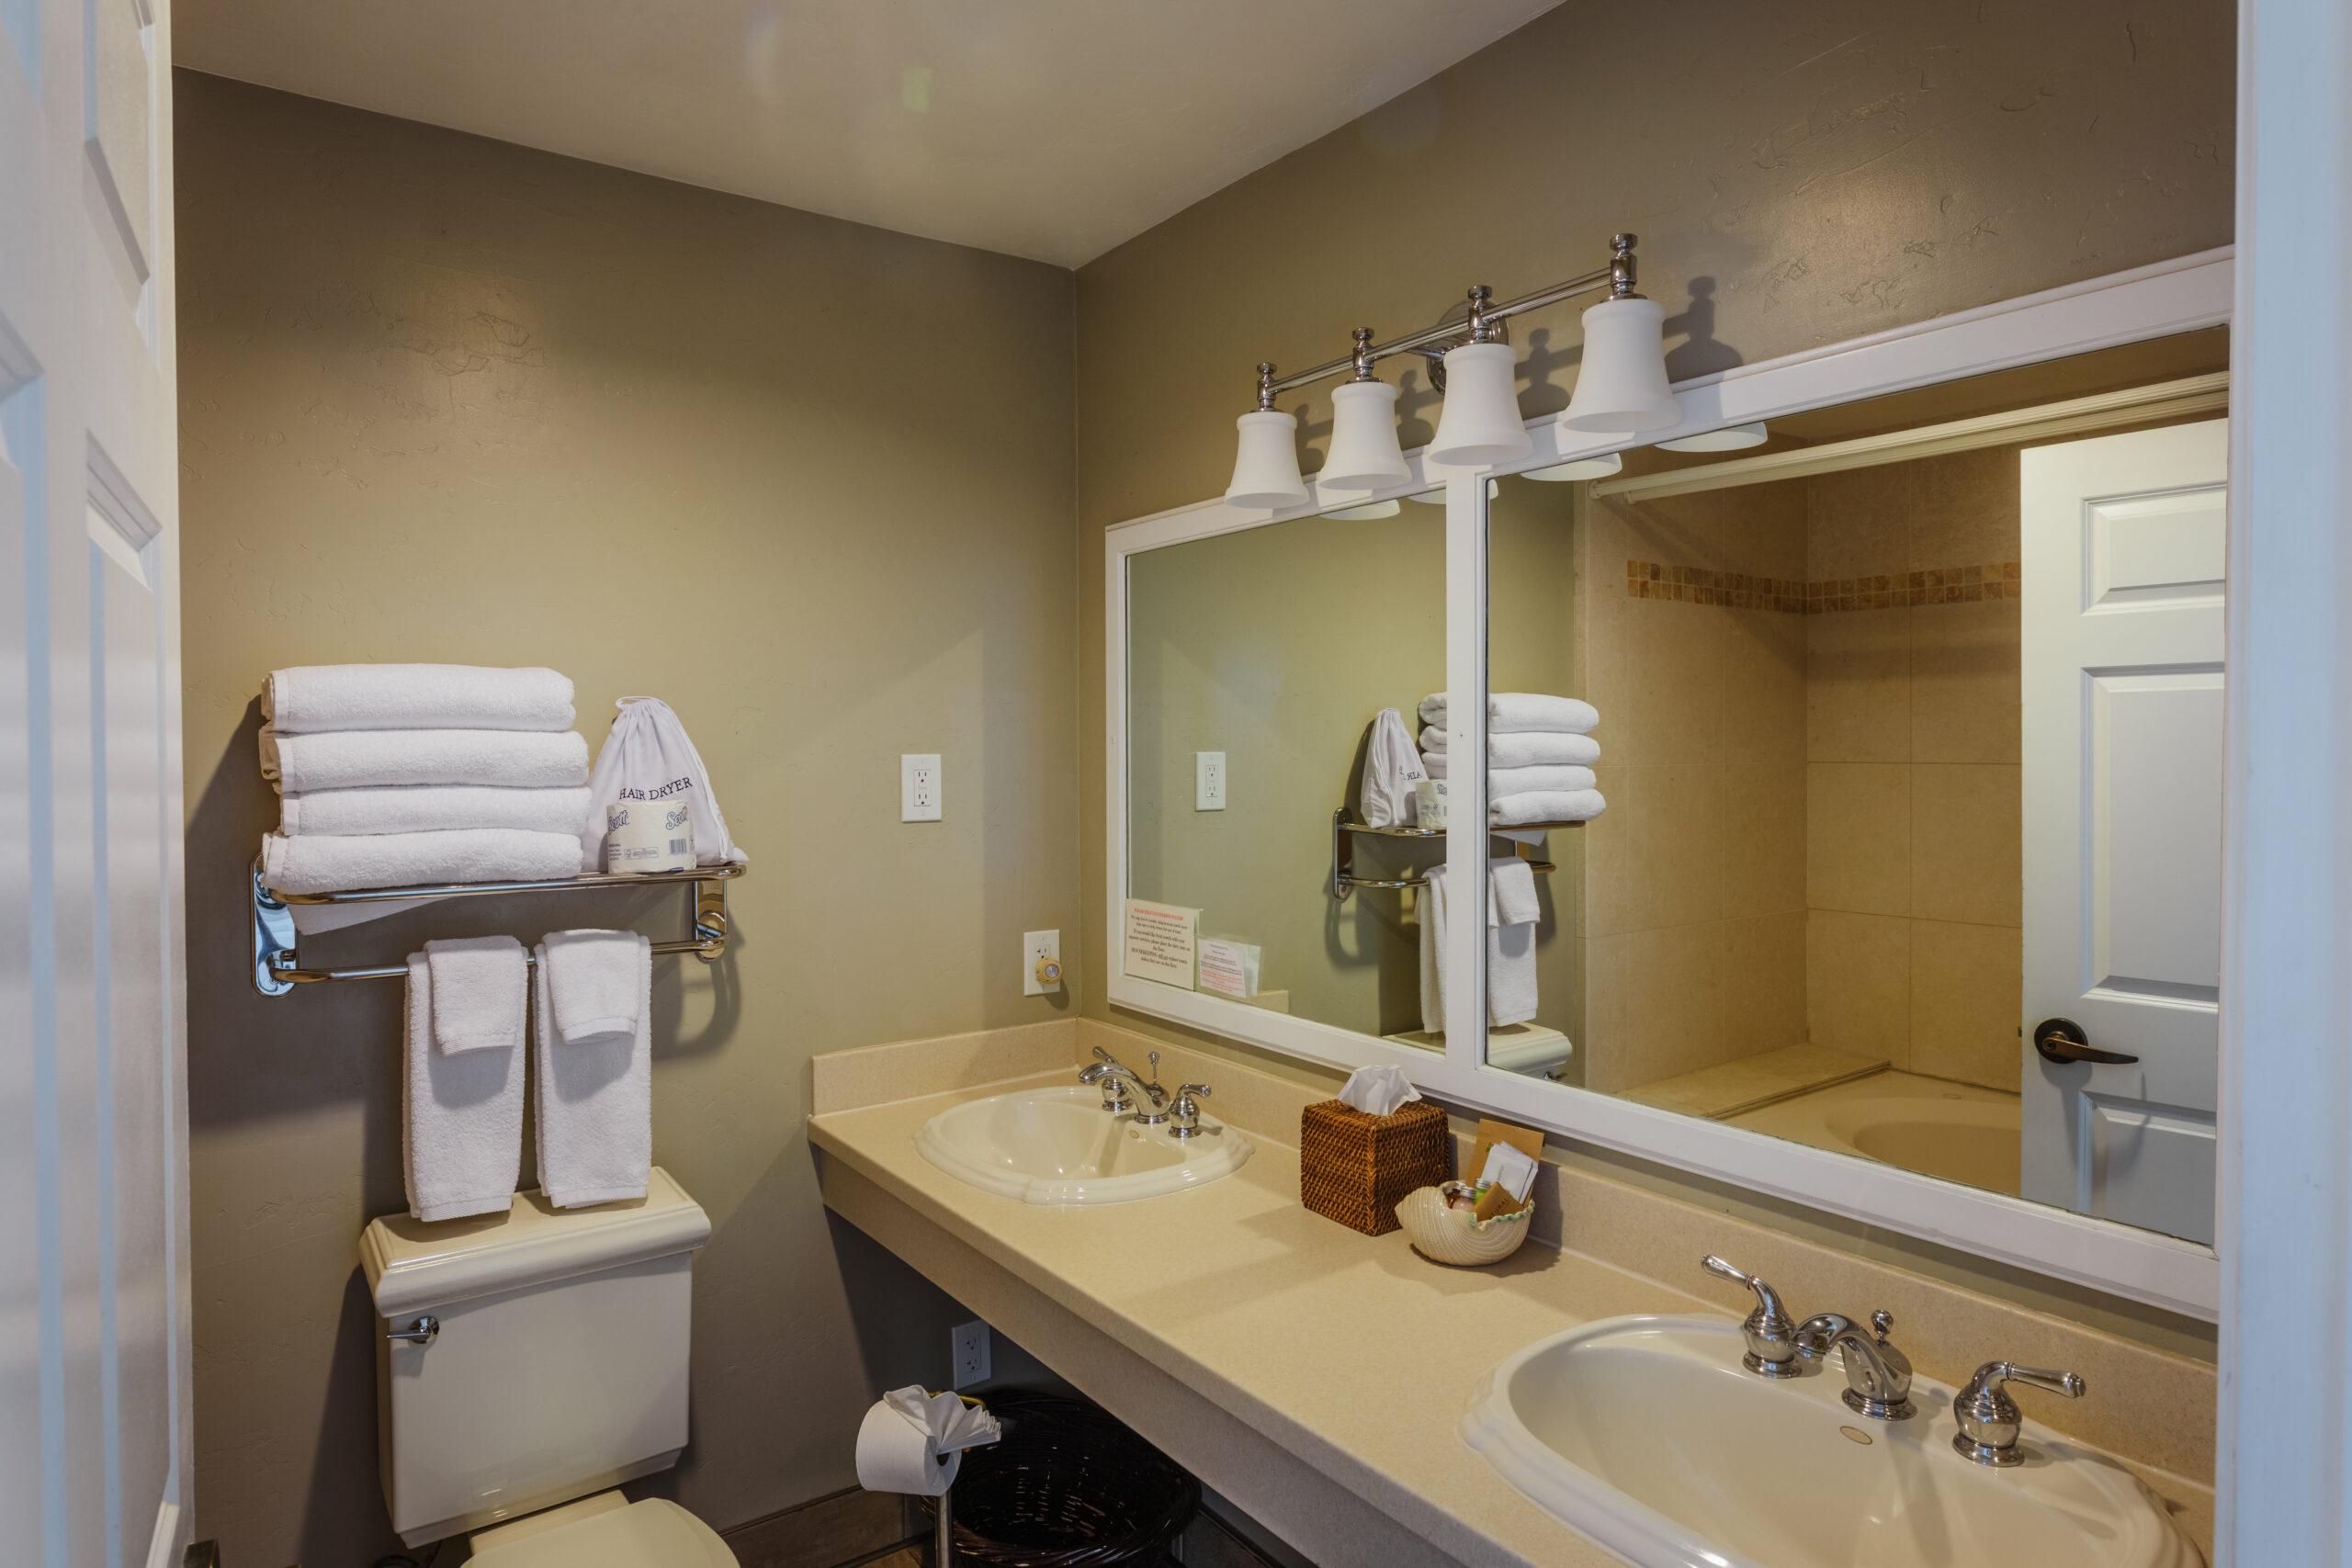 Room 1 Bathroom view